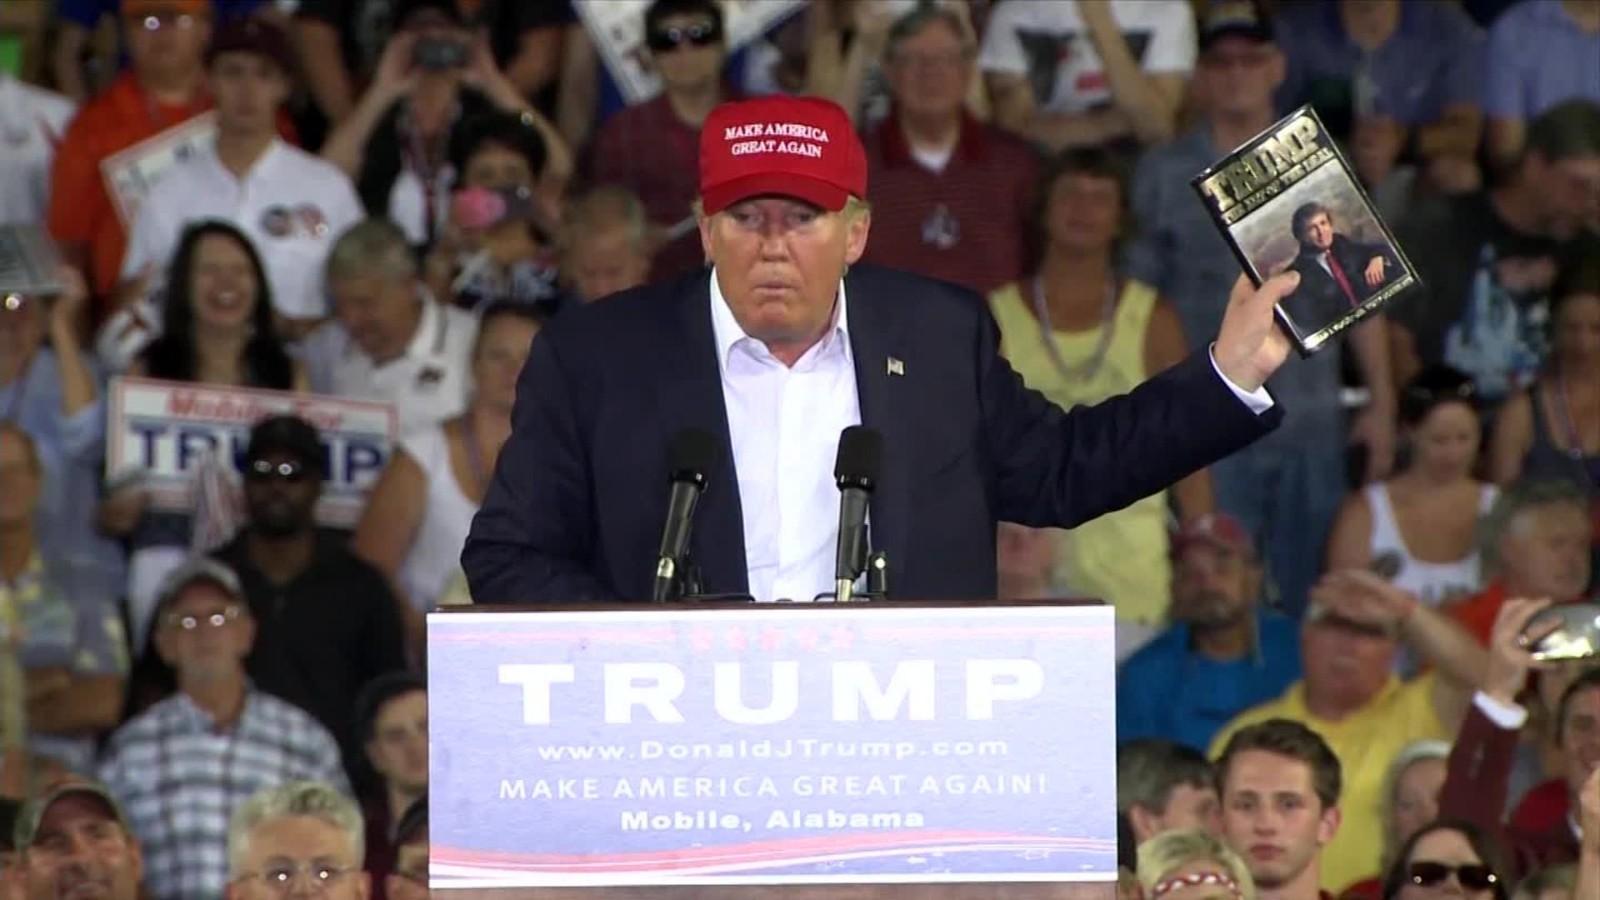 Donald Trump Is Not An Active Member Church Says